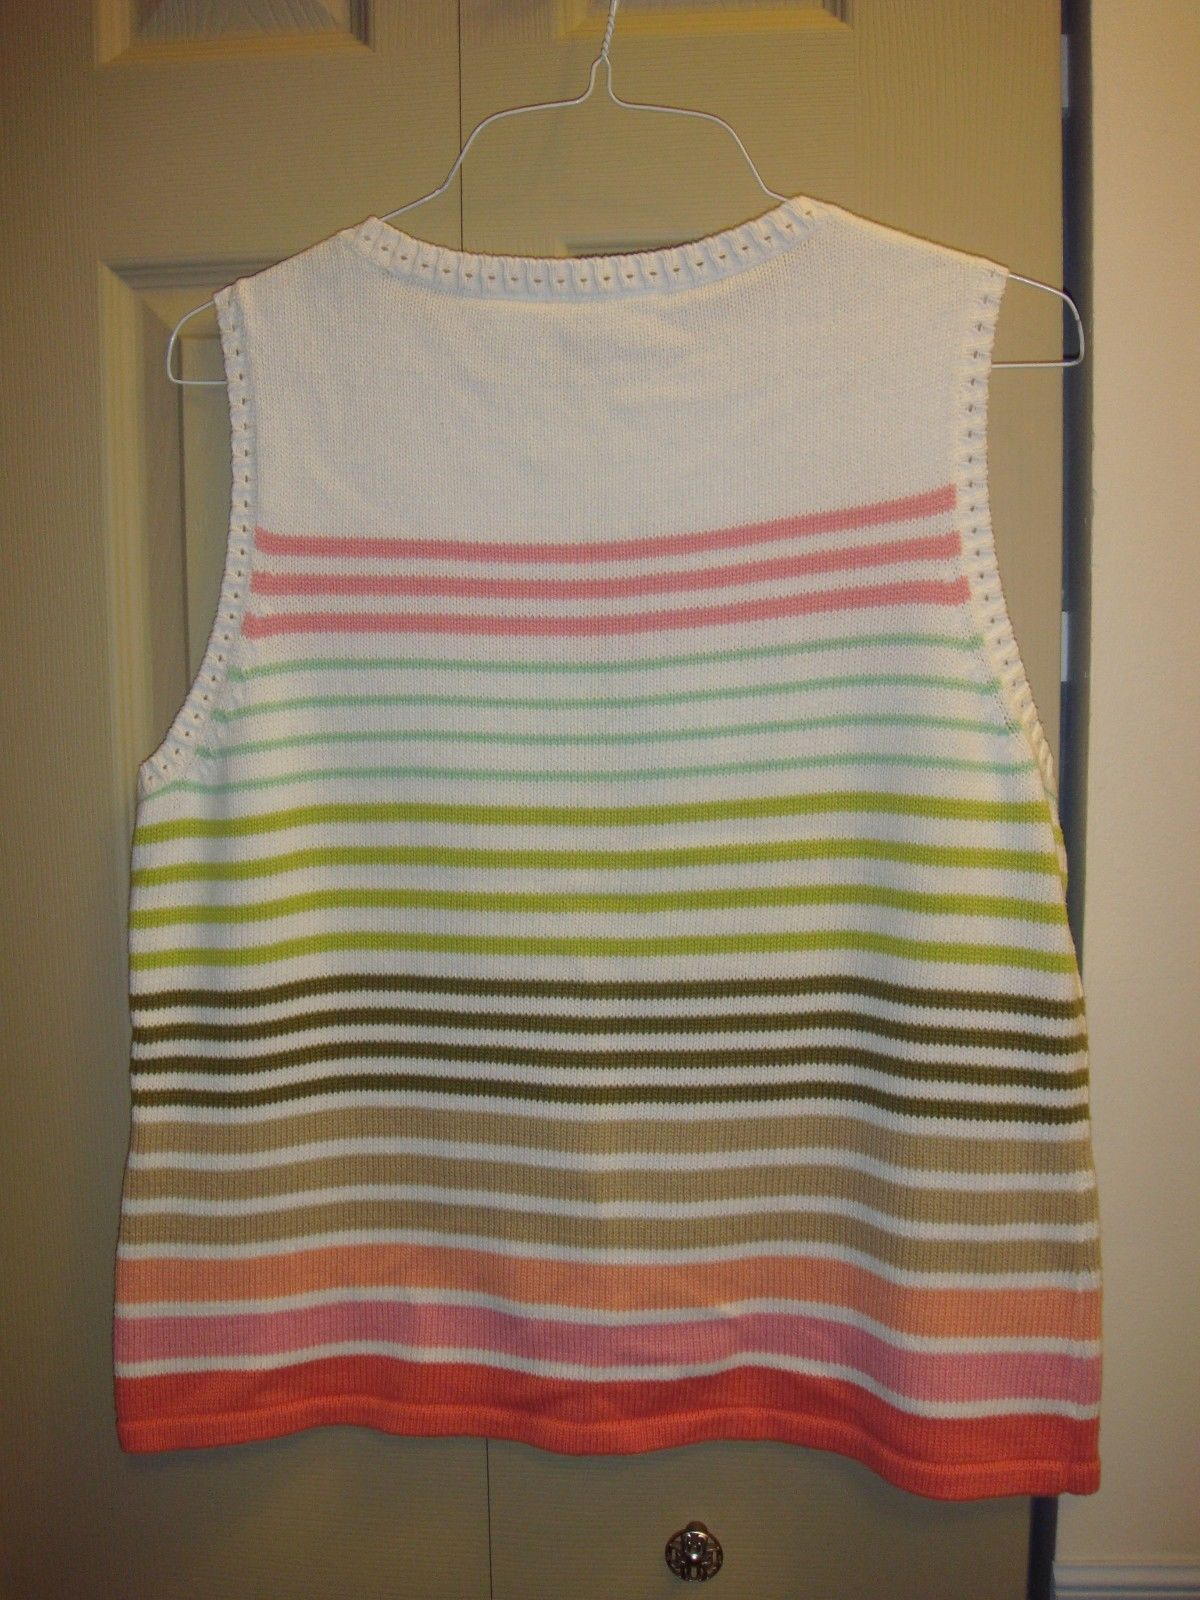 Liz Claiborne White Sleeveless Multi-Colored Striped Sweater Size XL